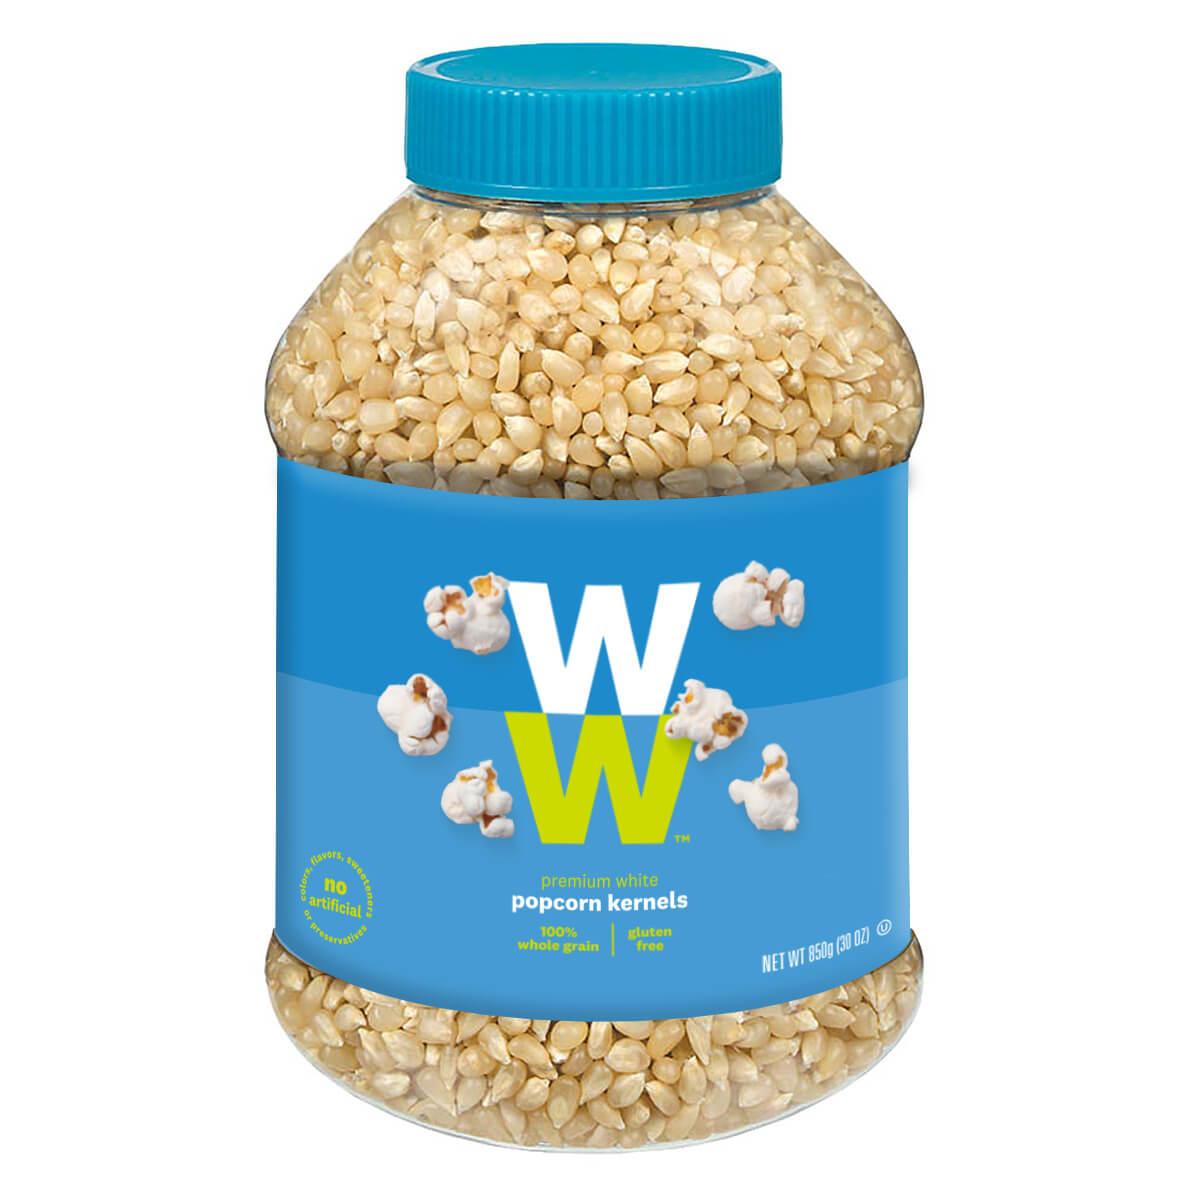 Premium white popcorn kernels, jar of kernels, gluten free, 100% whole grain